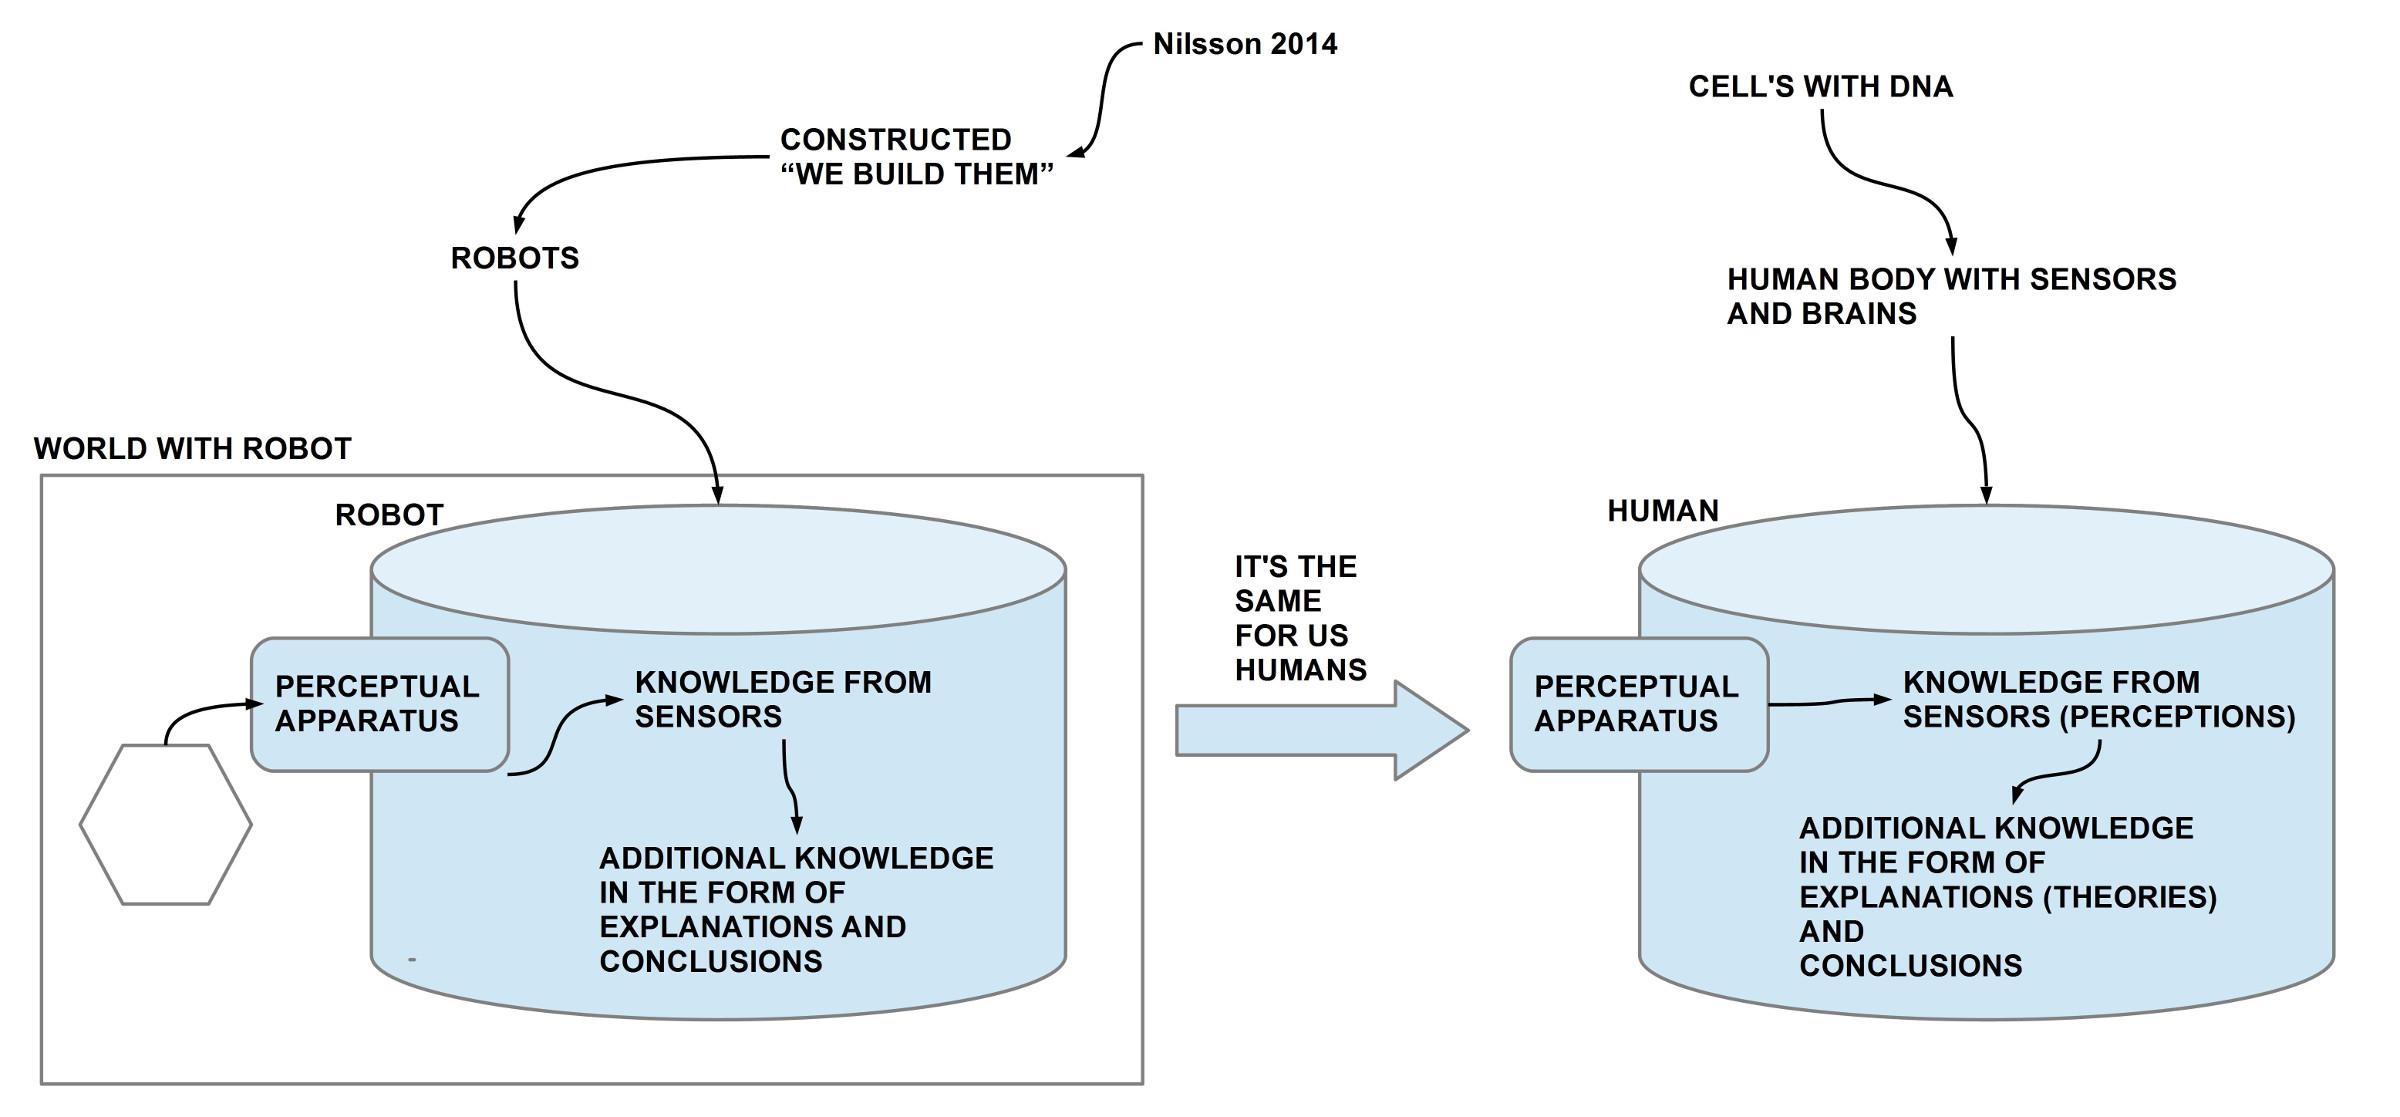 Nilsson 2014: Mensch so wie Roboter